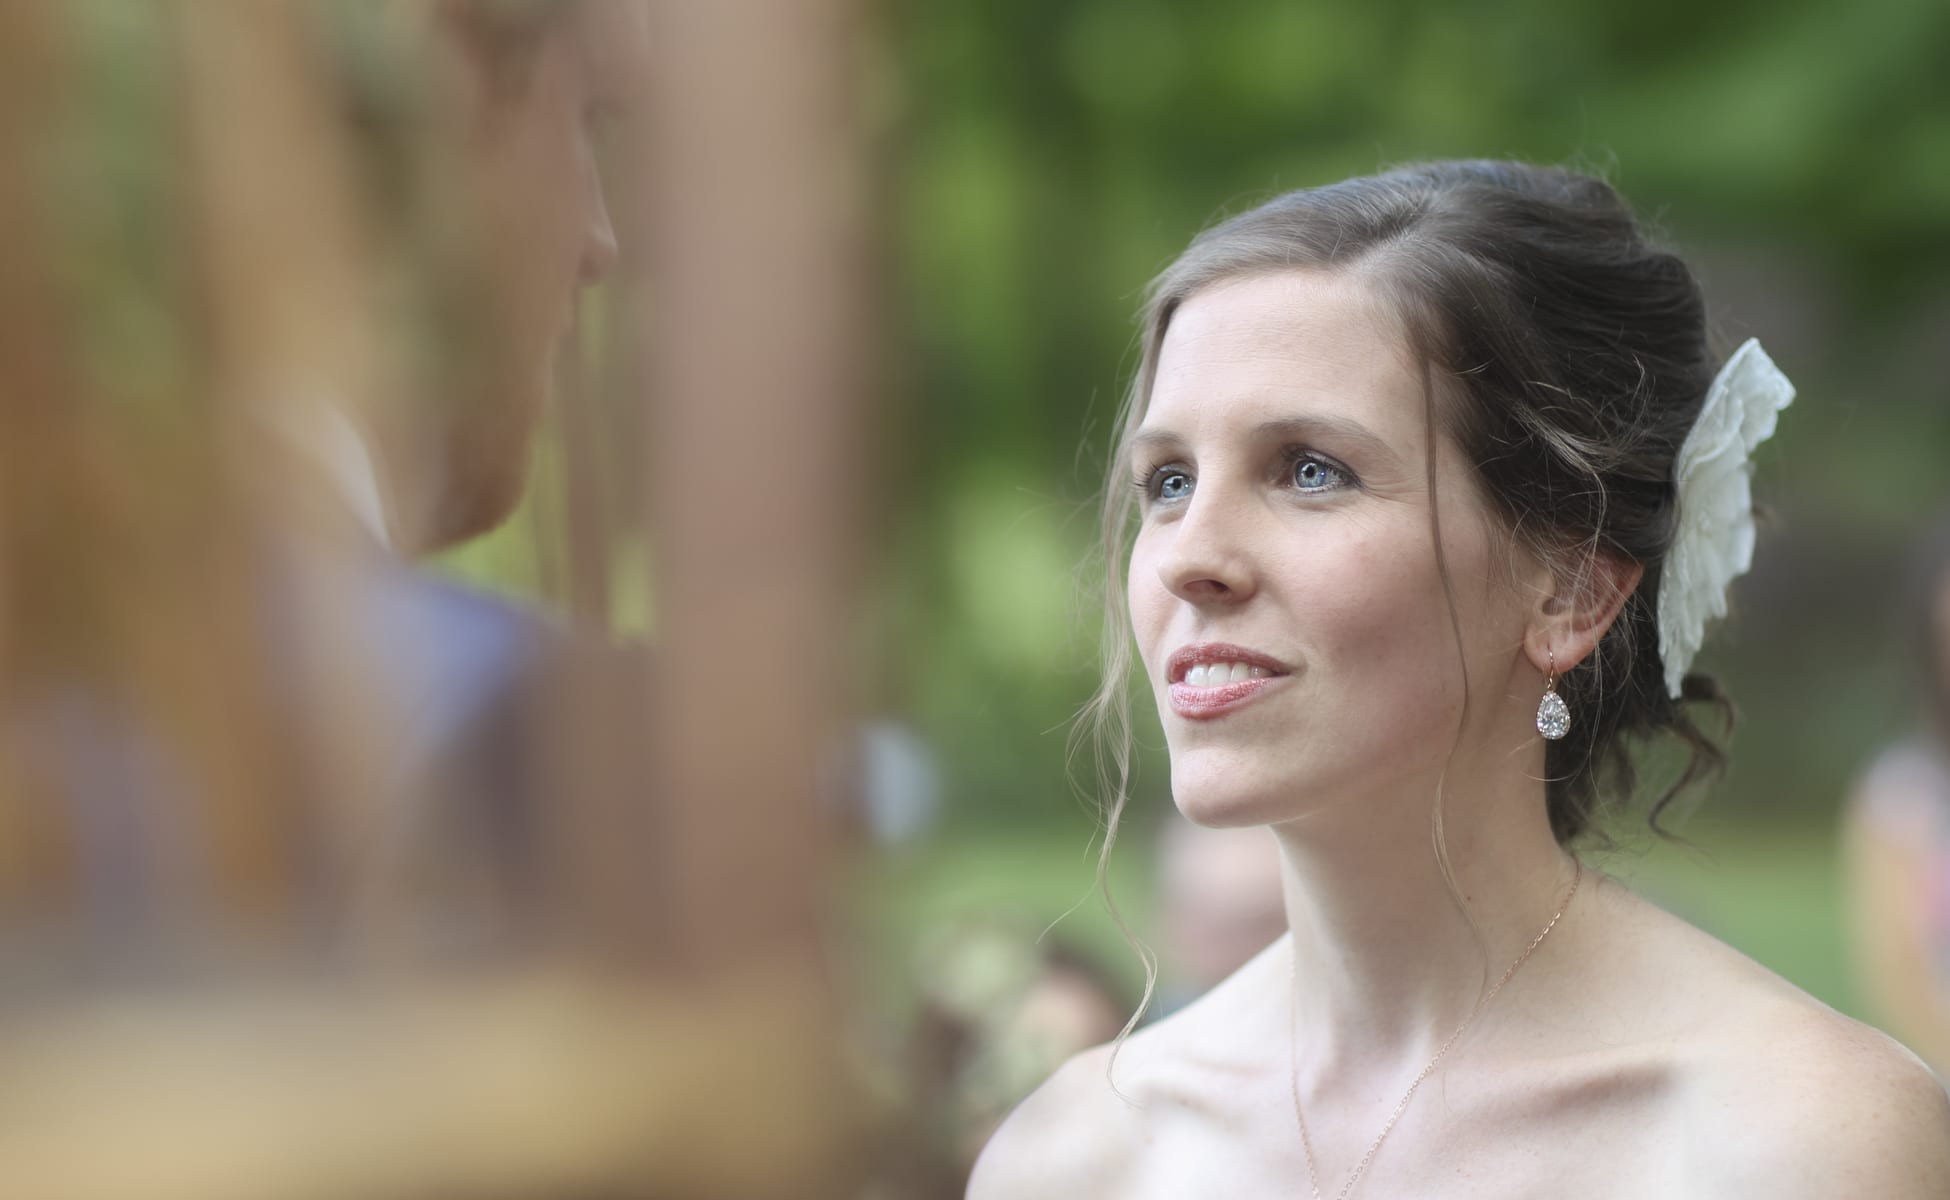 RI Wedding Photographer: Colleen and Jason's Backyard Wedding